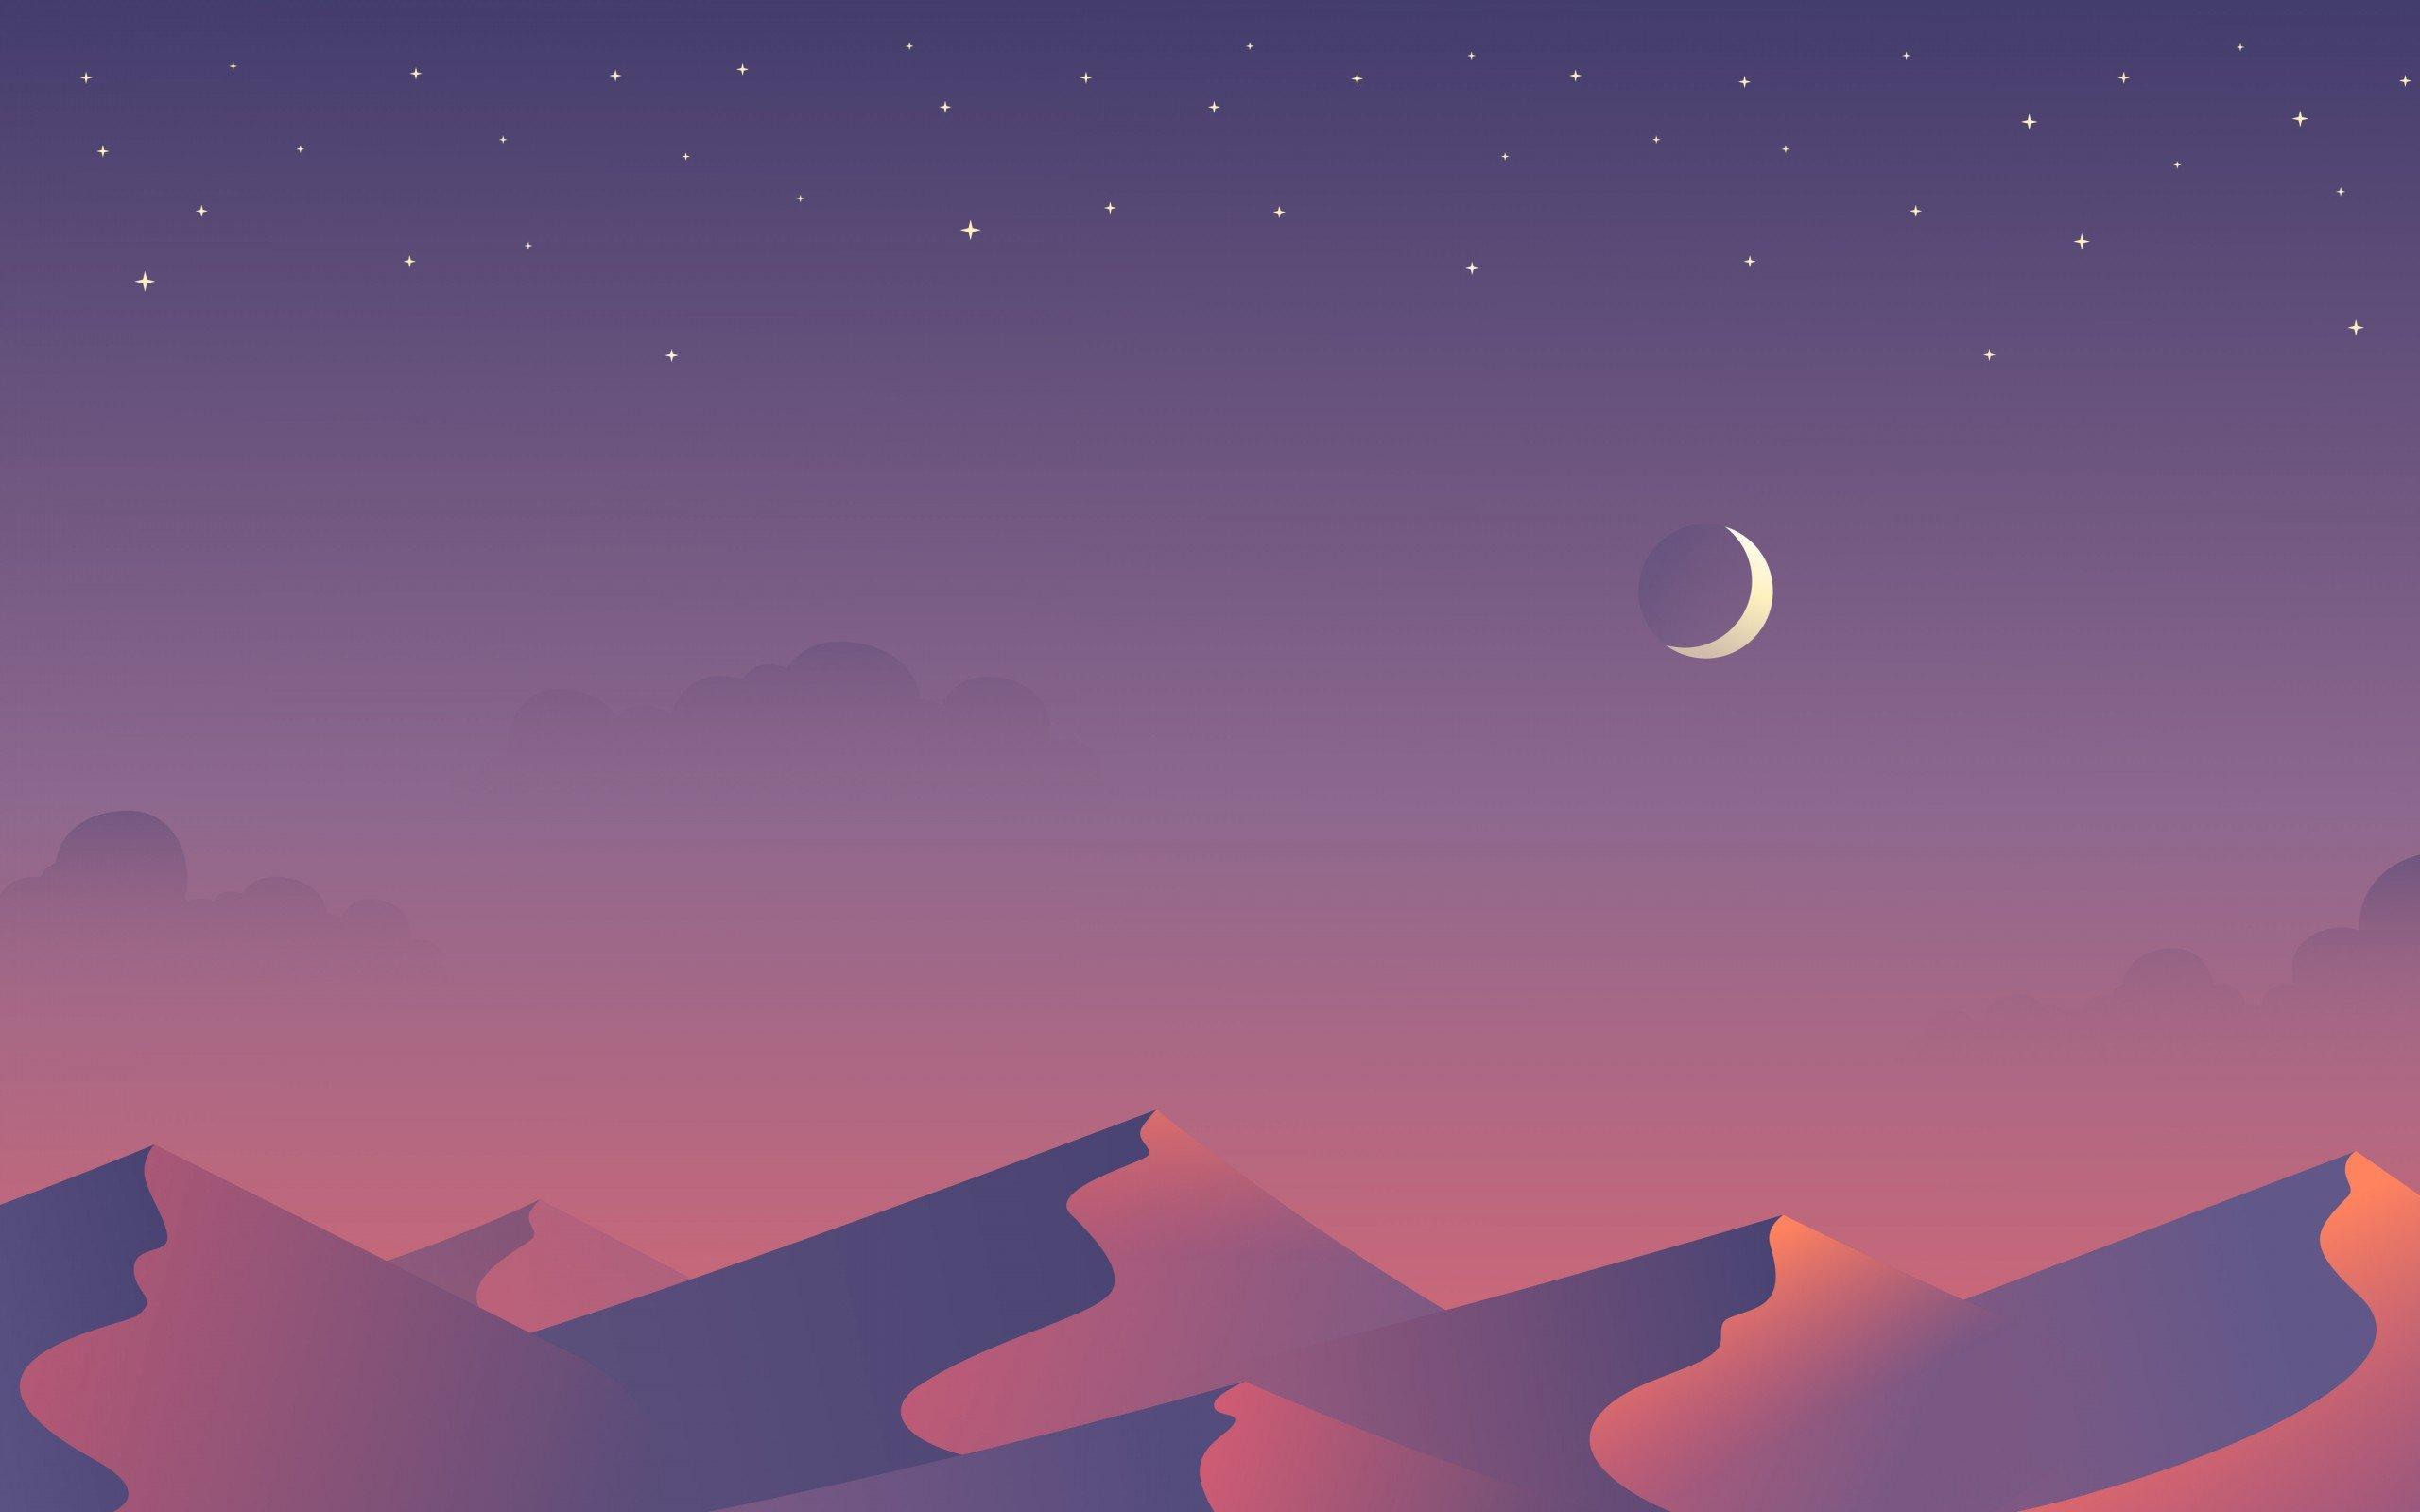 Wallpaper 2560x1600 Px Artwork Desert Dunes Minimalism Moon